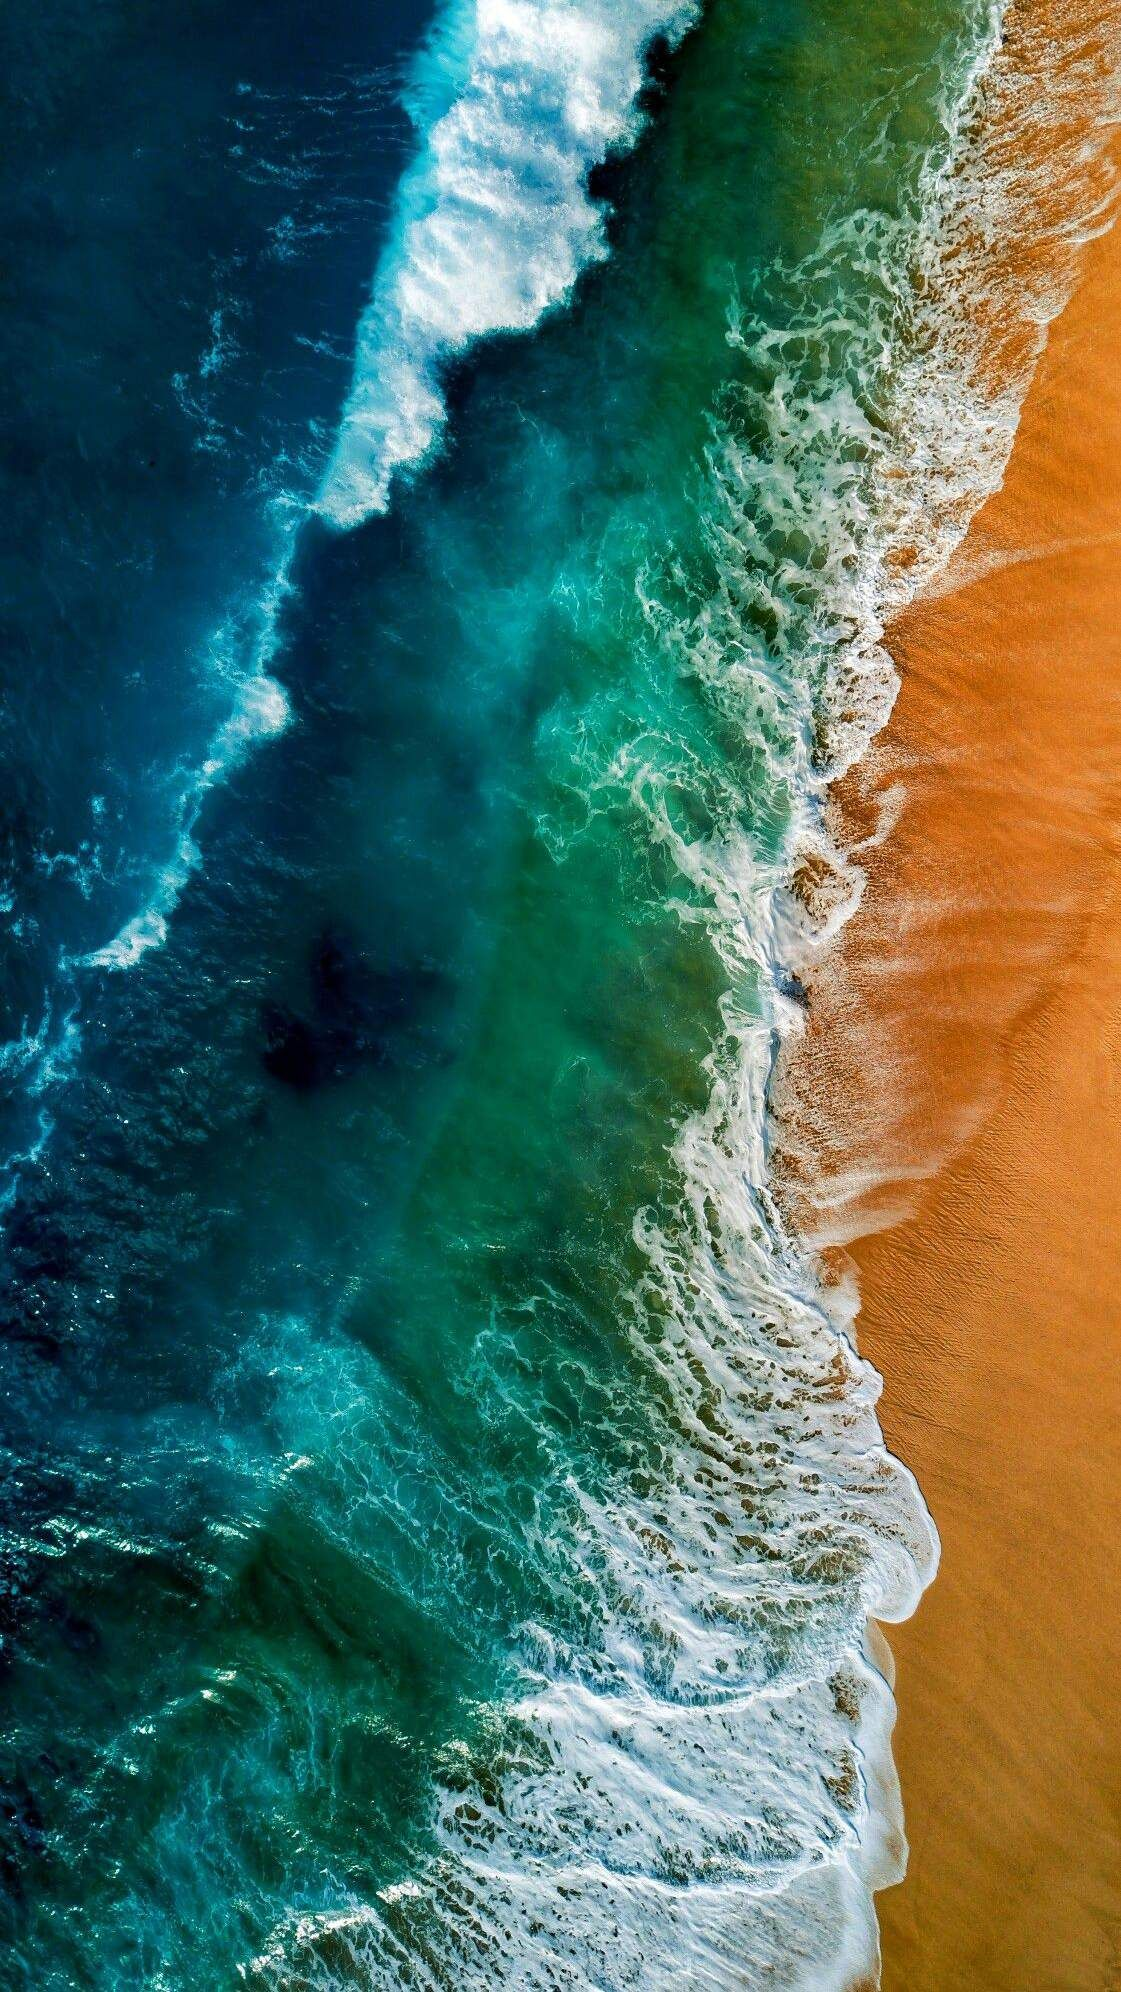 Beach Ocean Waves Sky View Iphone Wallpaper Iphone Wallpaper Earth Ocean Wallpaper Wallpaper Pictures